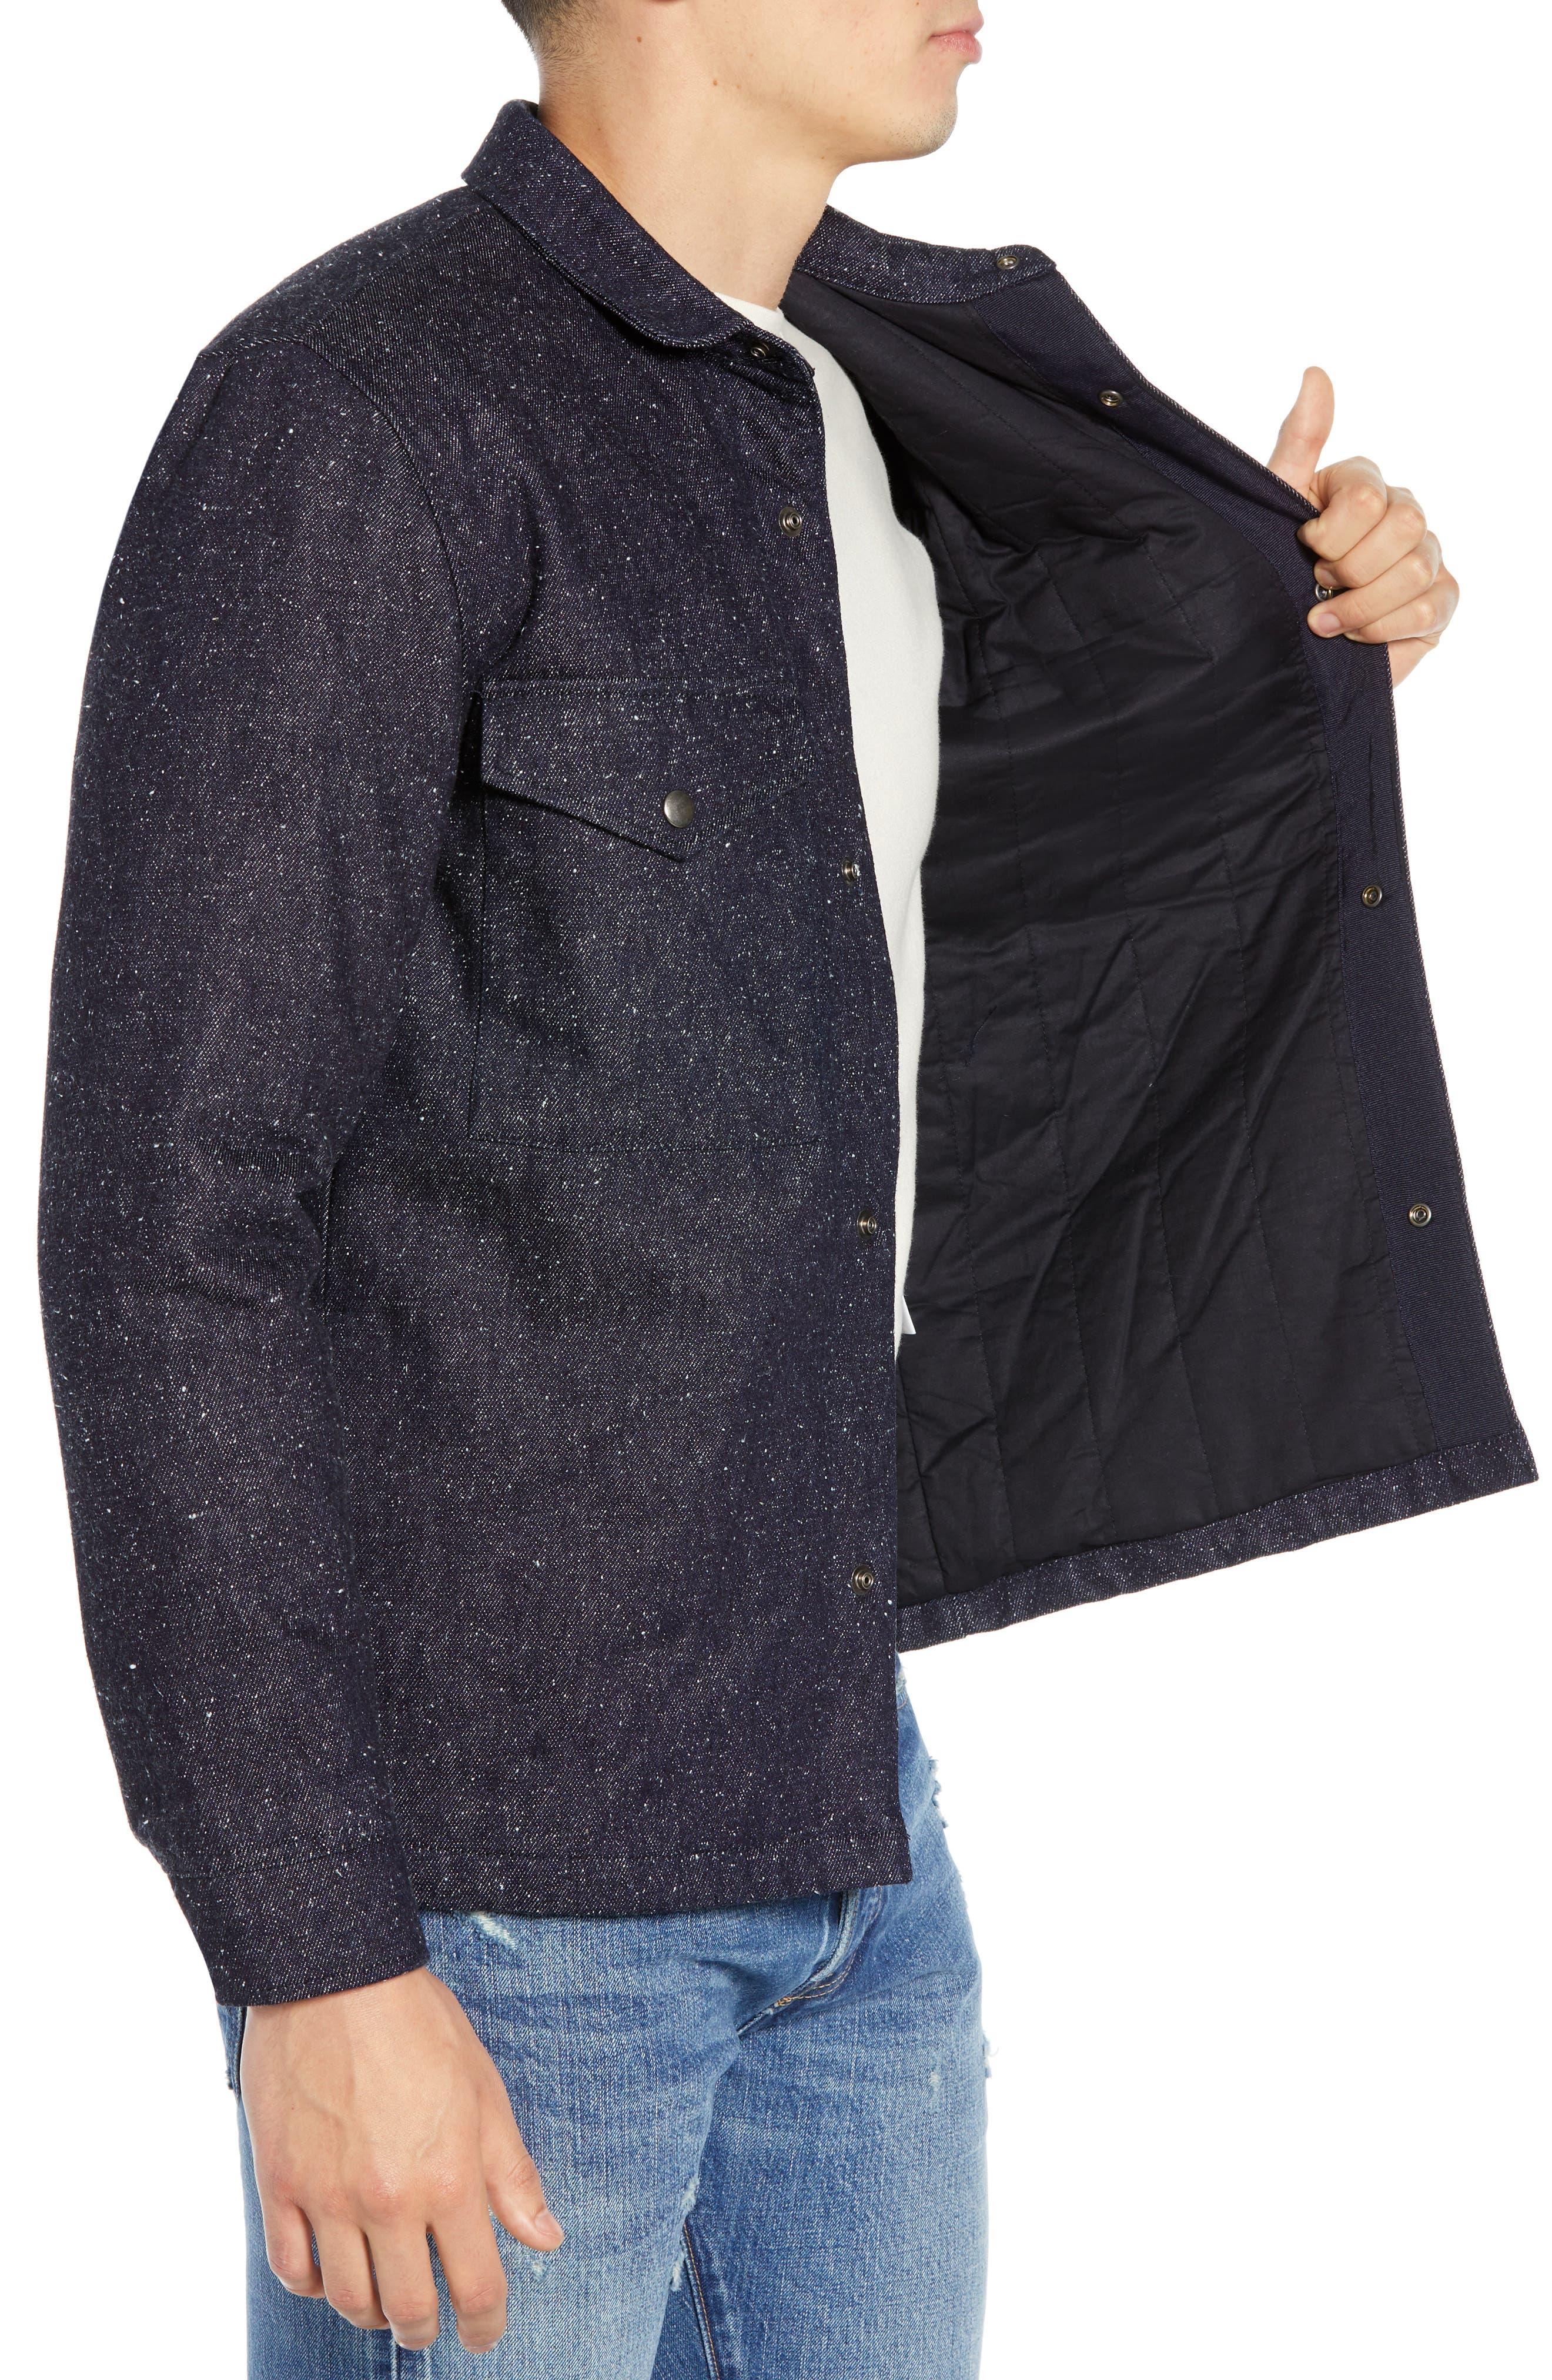 Nep Shirt Jacket,                             Alternate thumbnail 3, color,                             DENIM BLUES